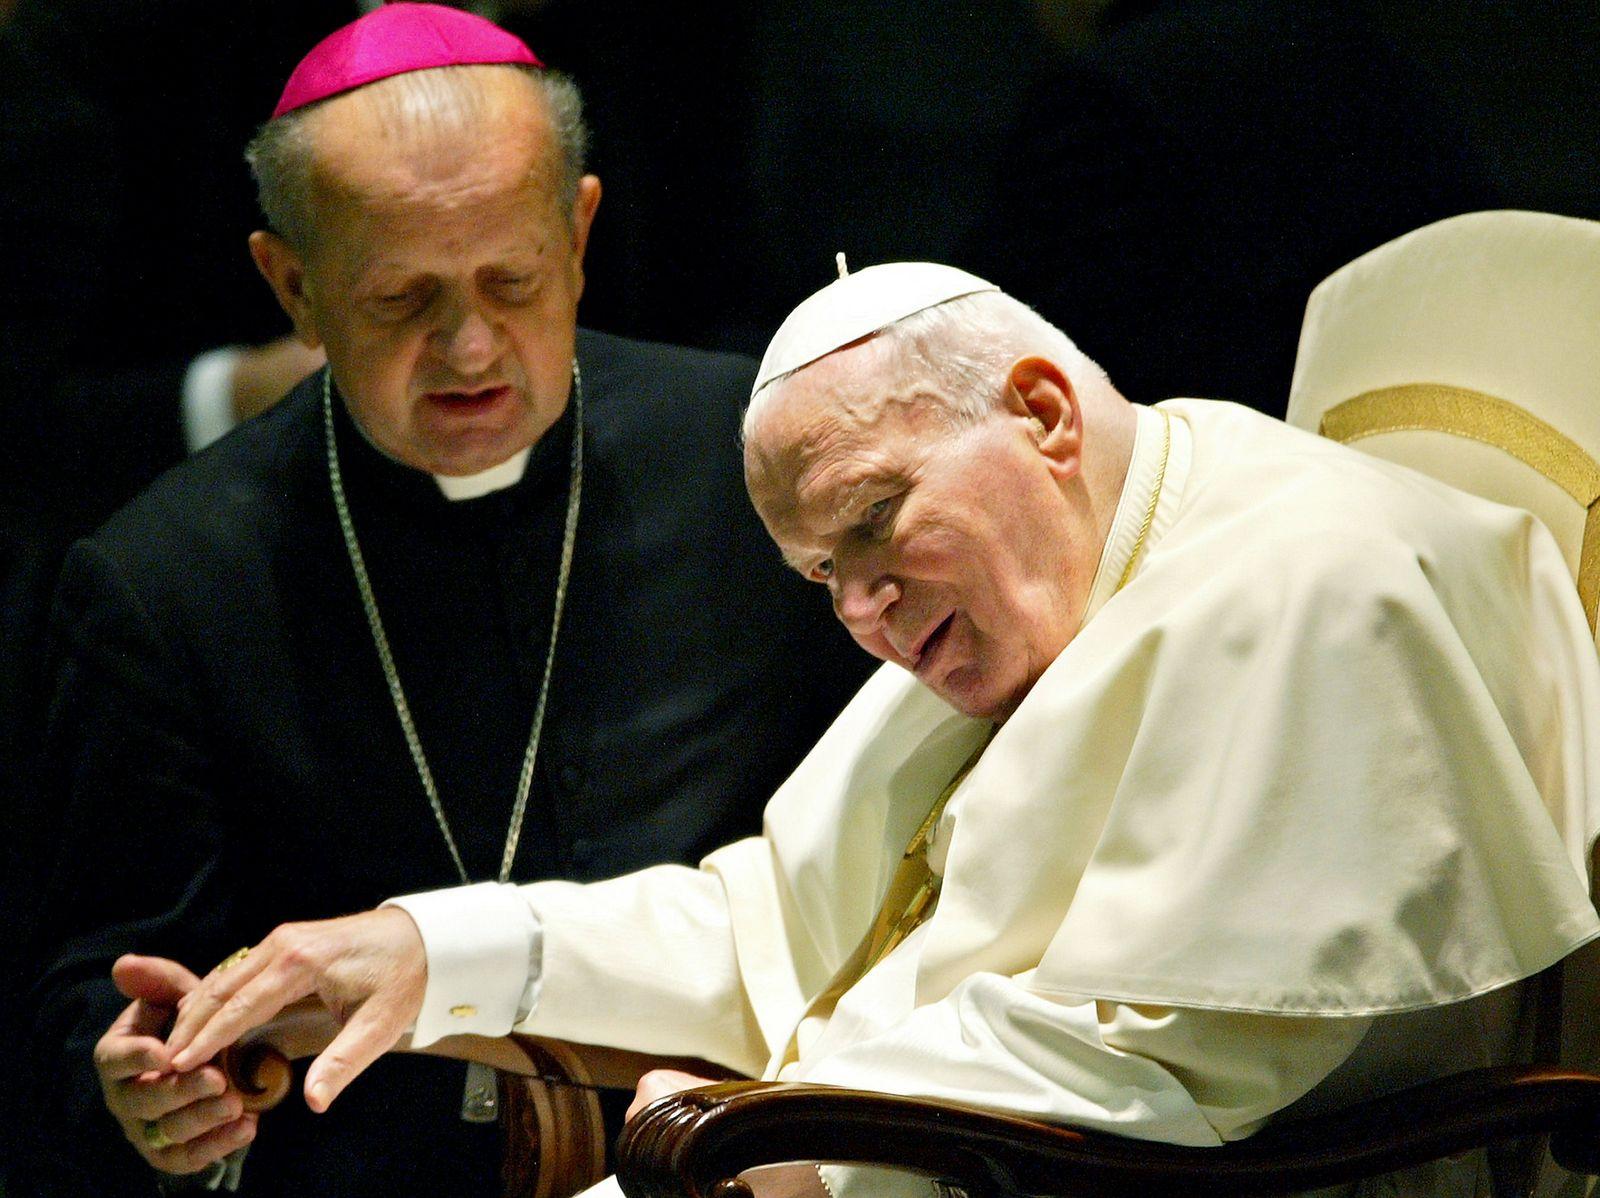 VATICAN-POPE-HEALTH-DZIWISZ